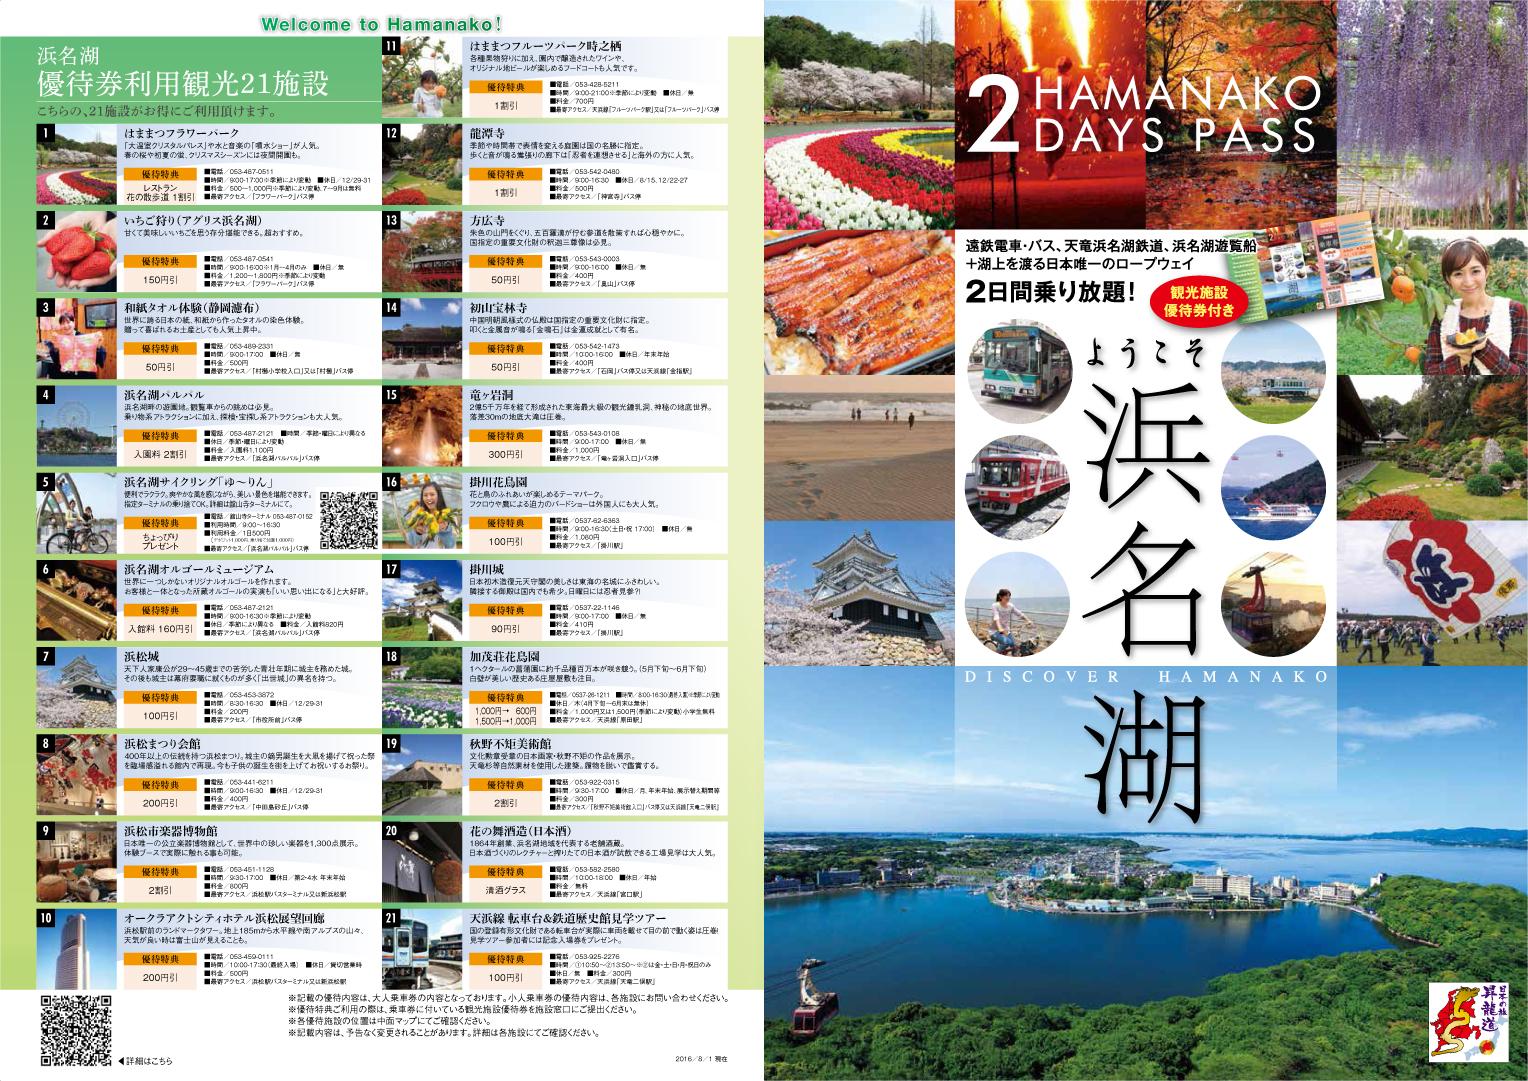 http://www.inhamamatsu.com/japanese/recommend/hnkrp2_omo.jpg